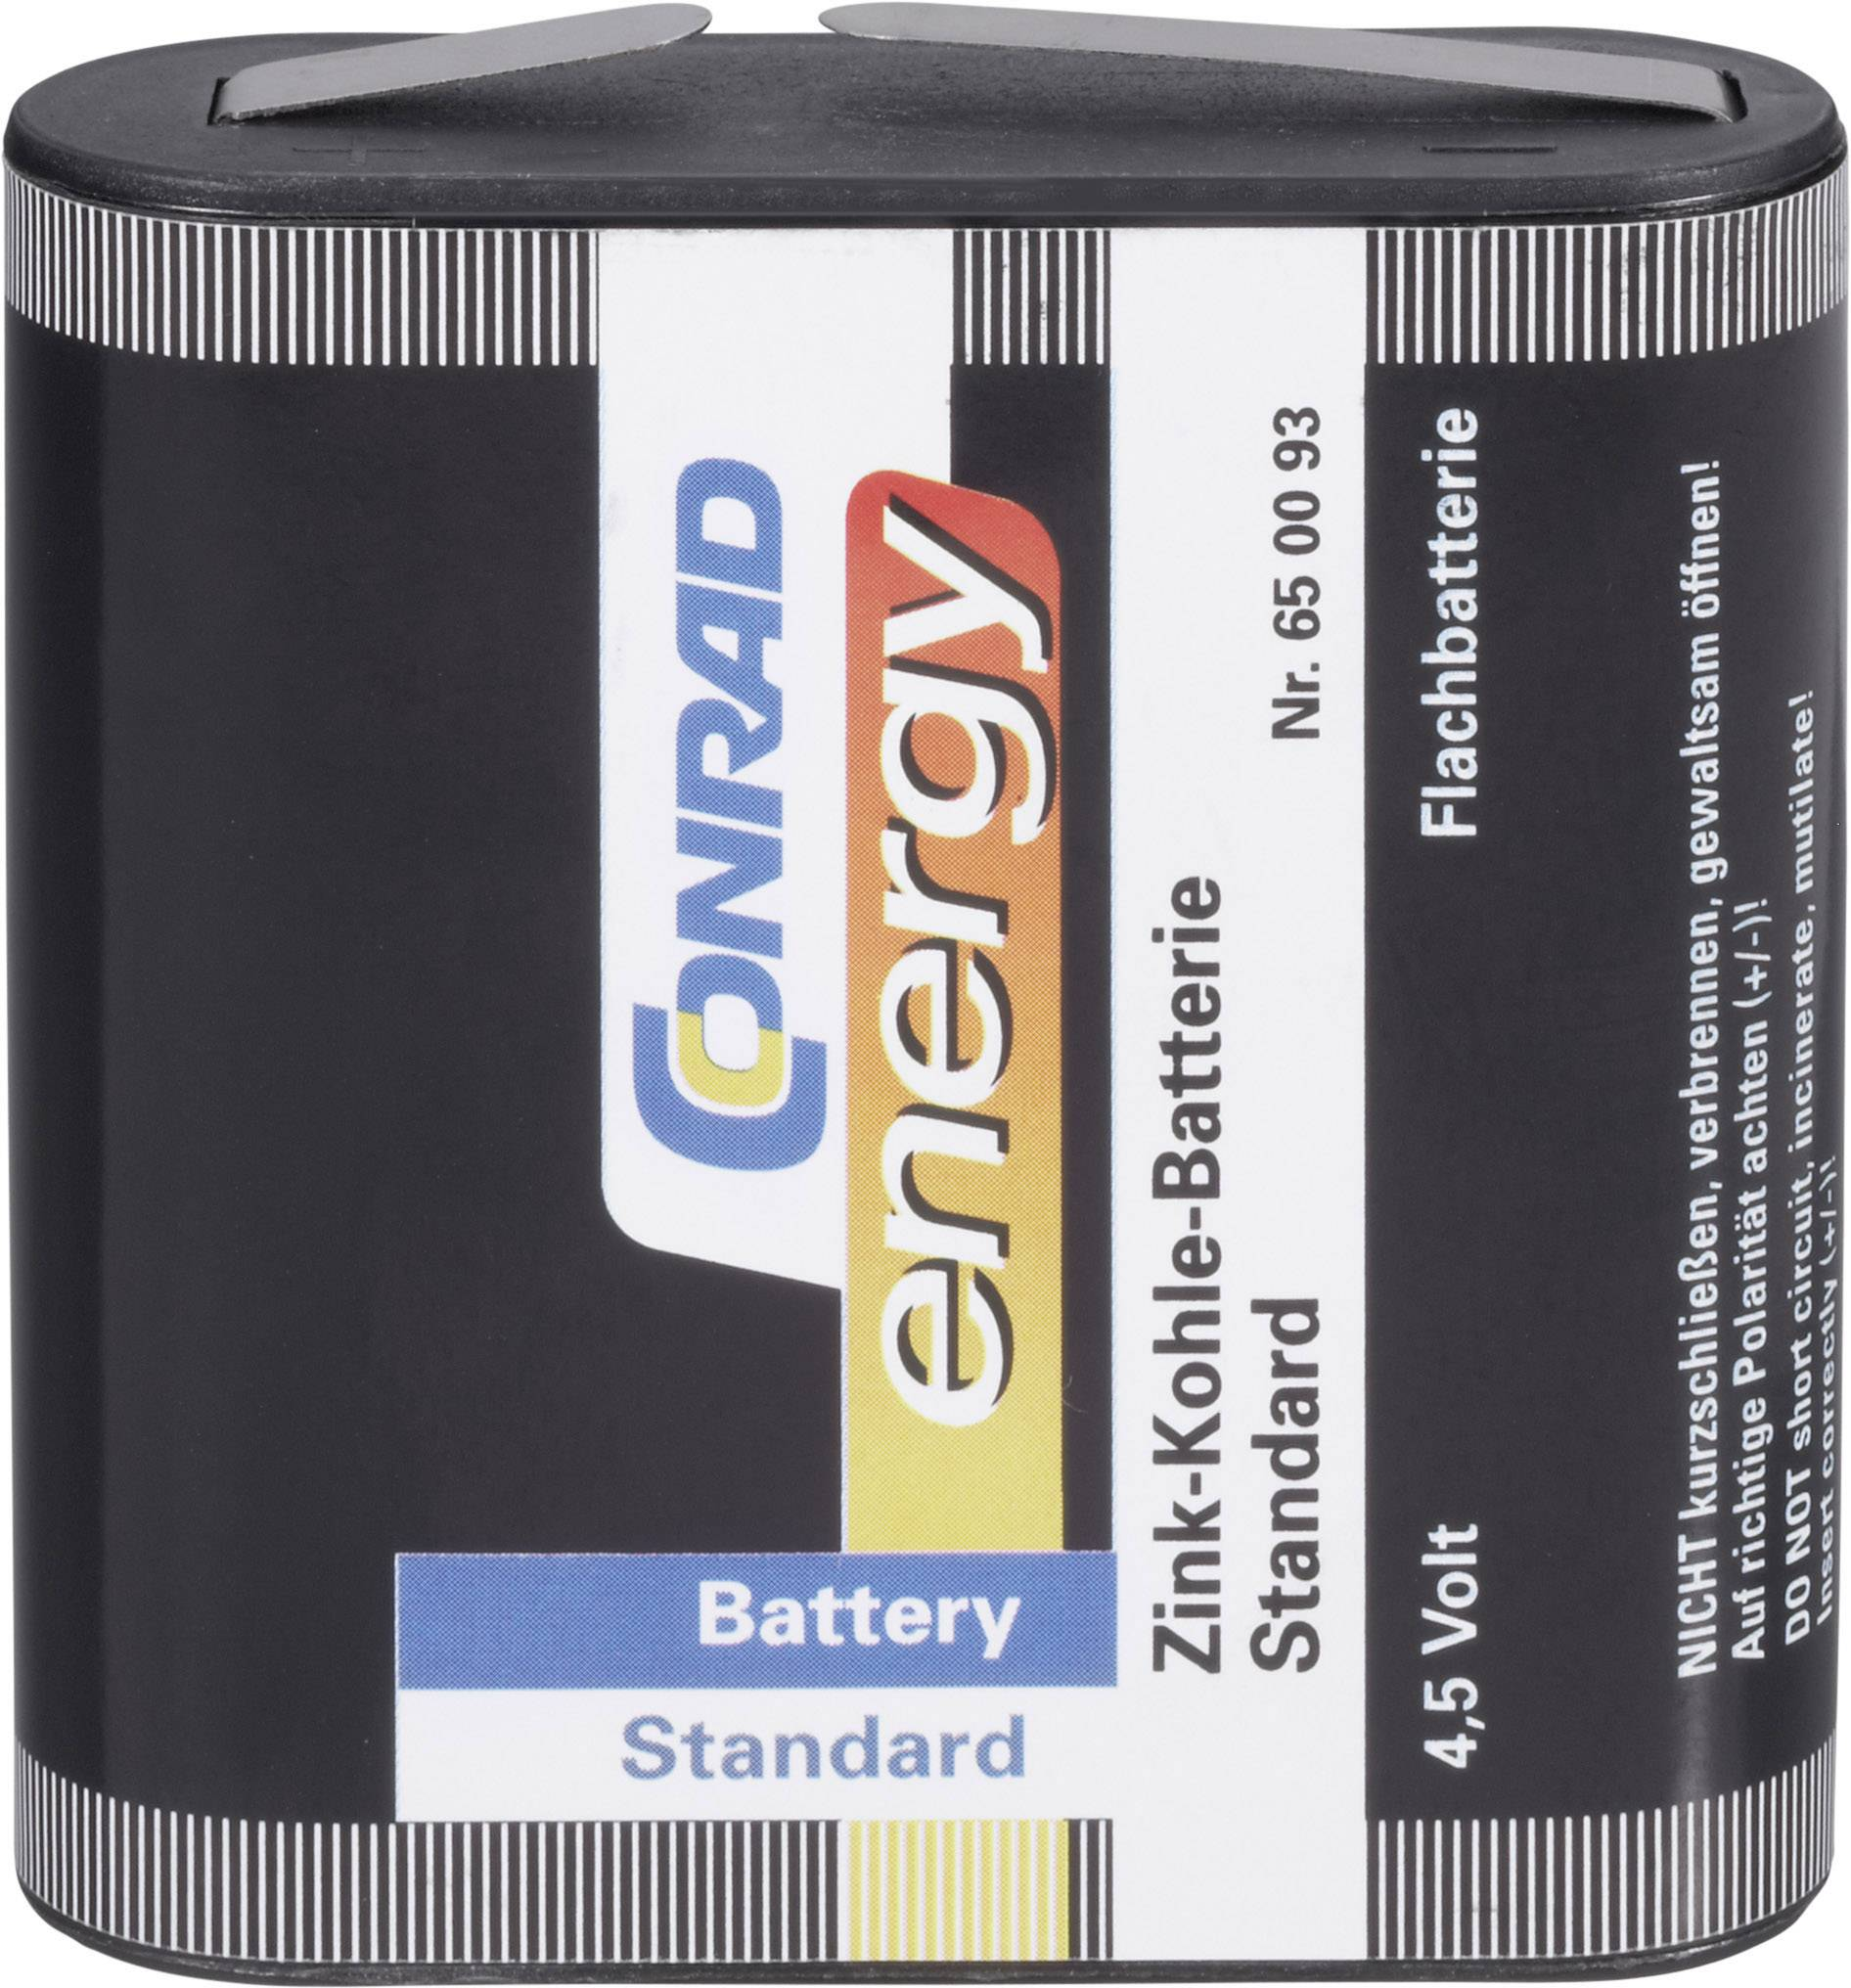 Zinkouhlíková baterie Conrad Energy, typ plochá 4,5 V, 2000 mAh